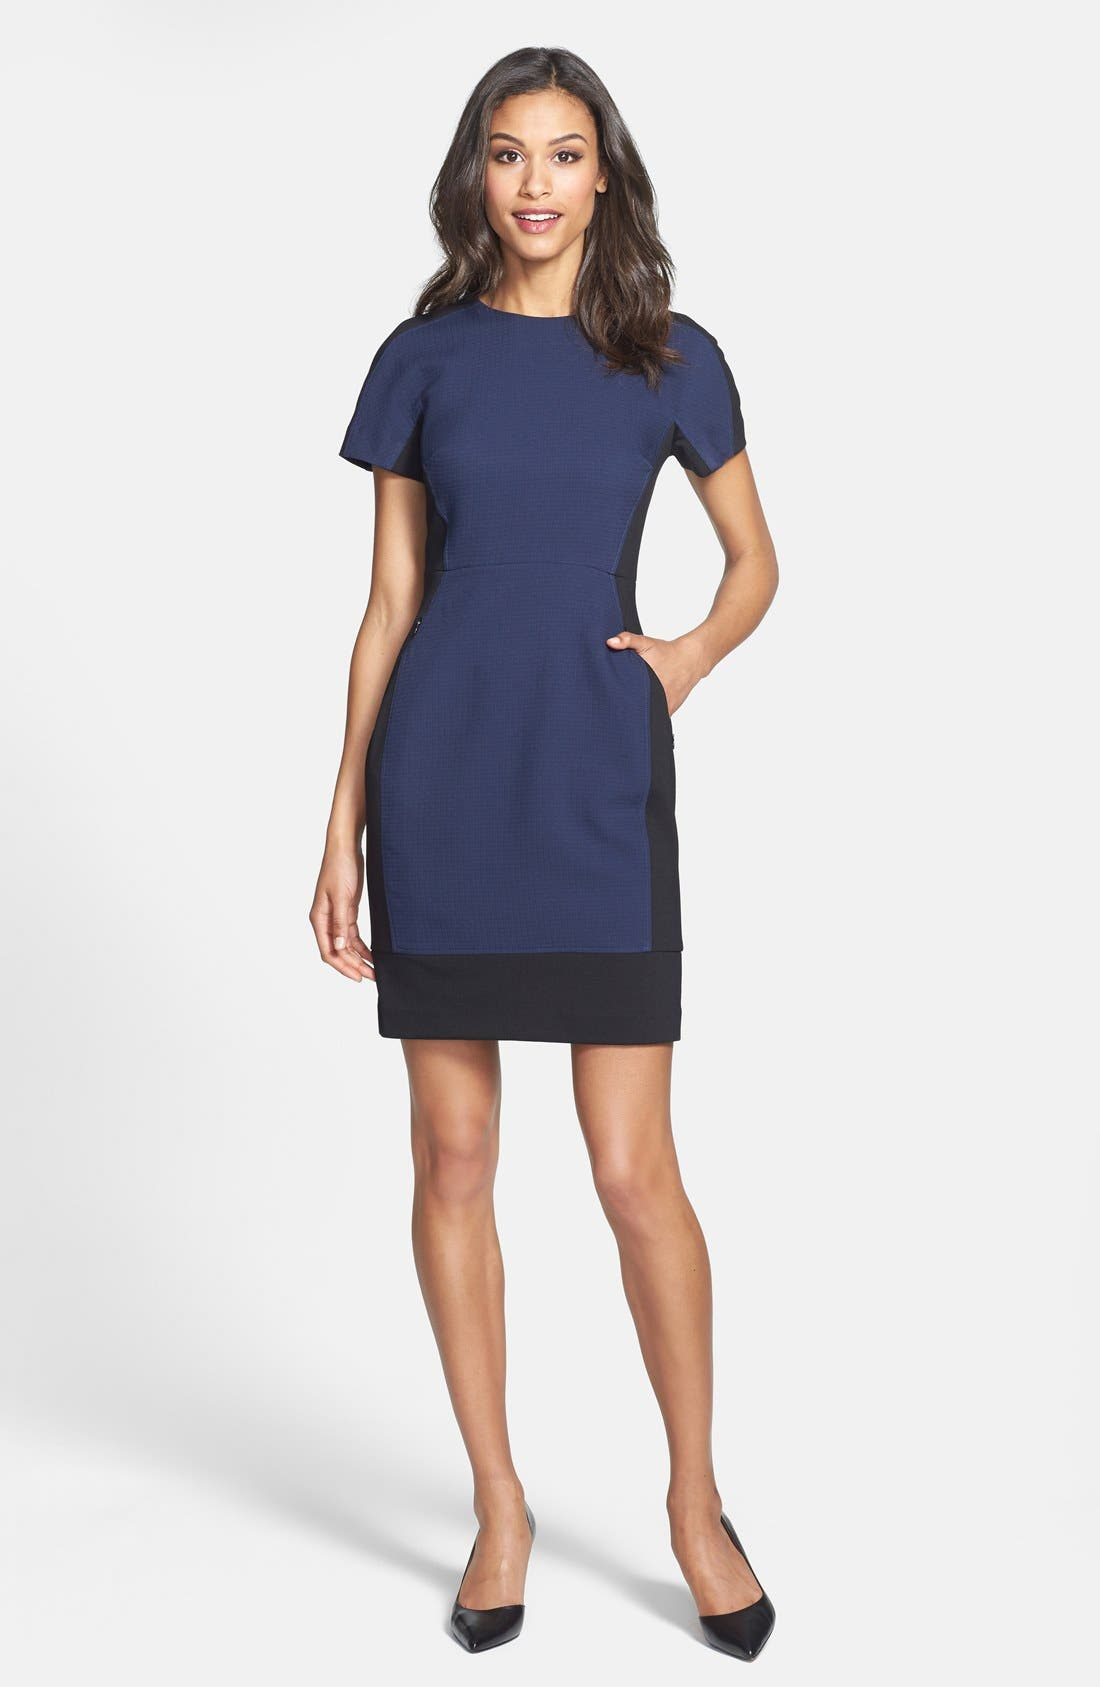 Alternate Image 1 Selected - Halogen® Colorblock Mixed Media Sheath Dress (Regular & Petite)